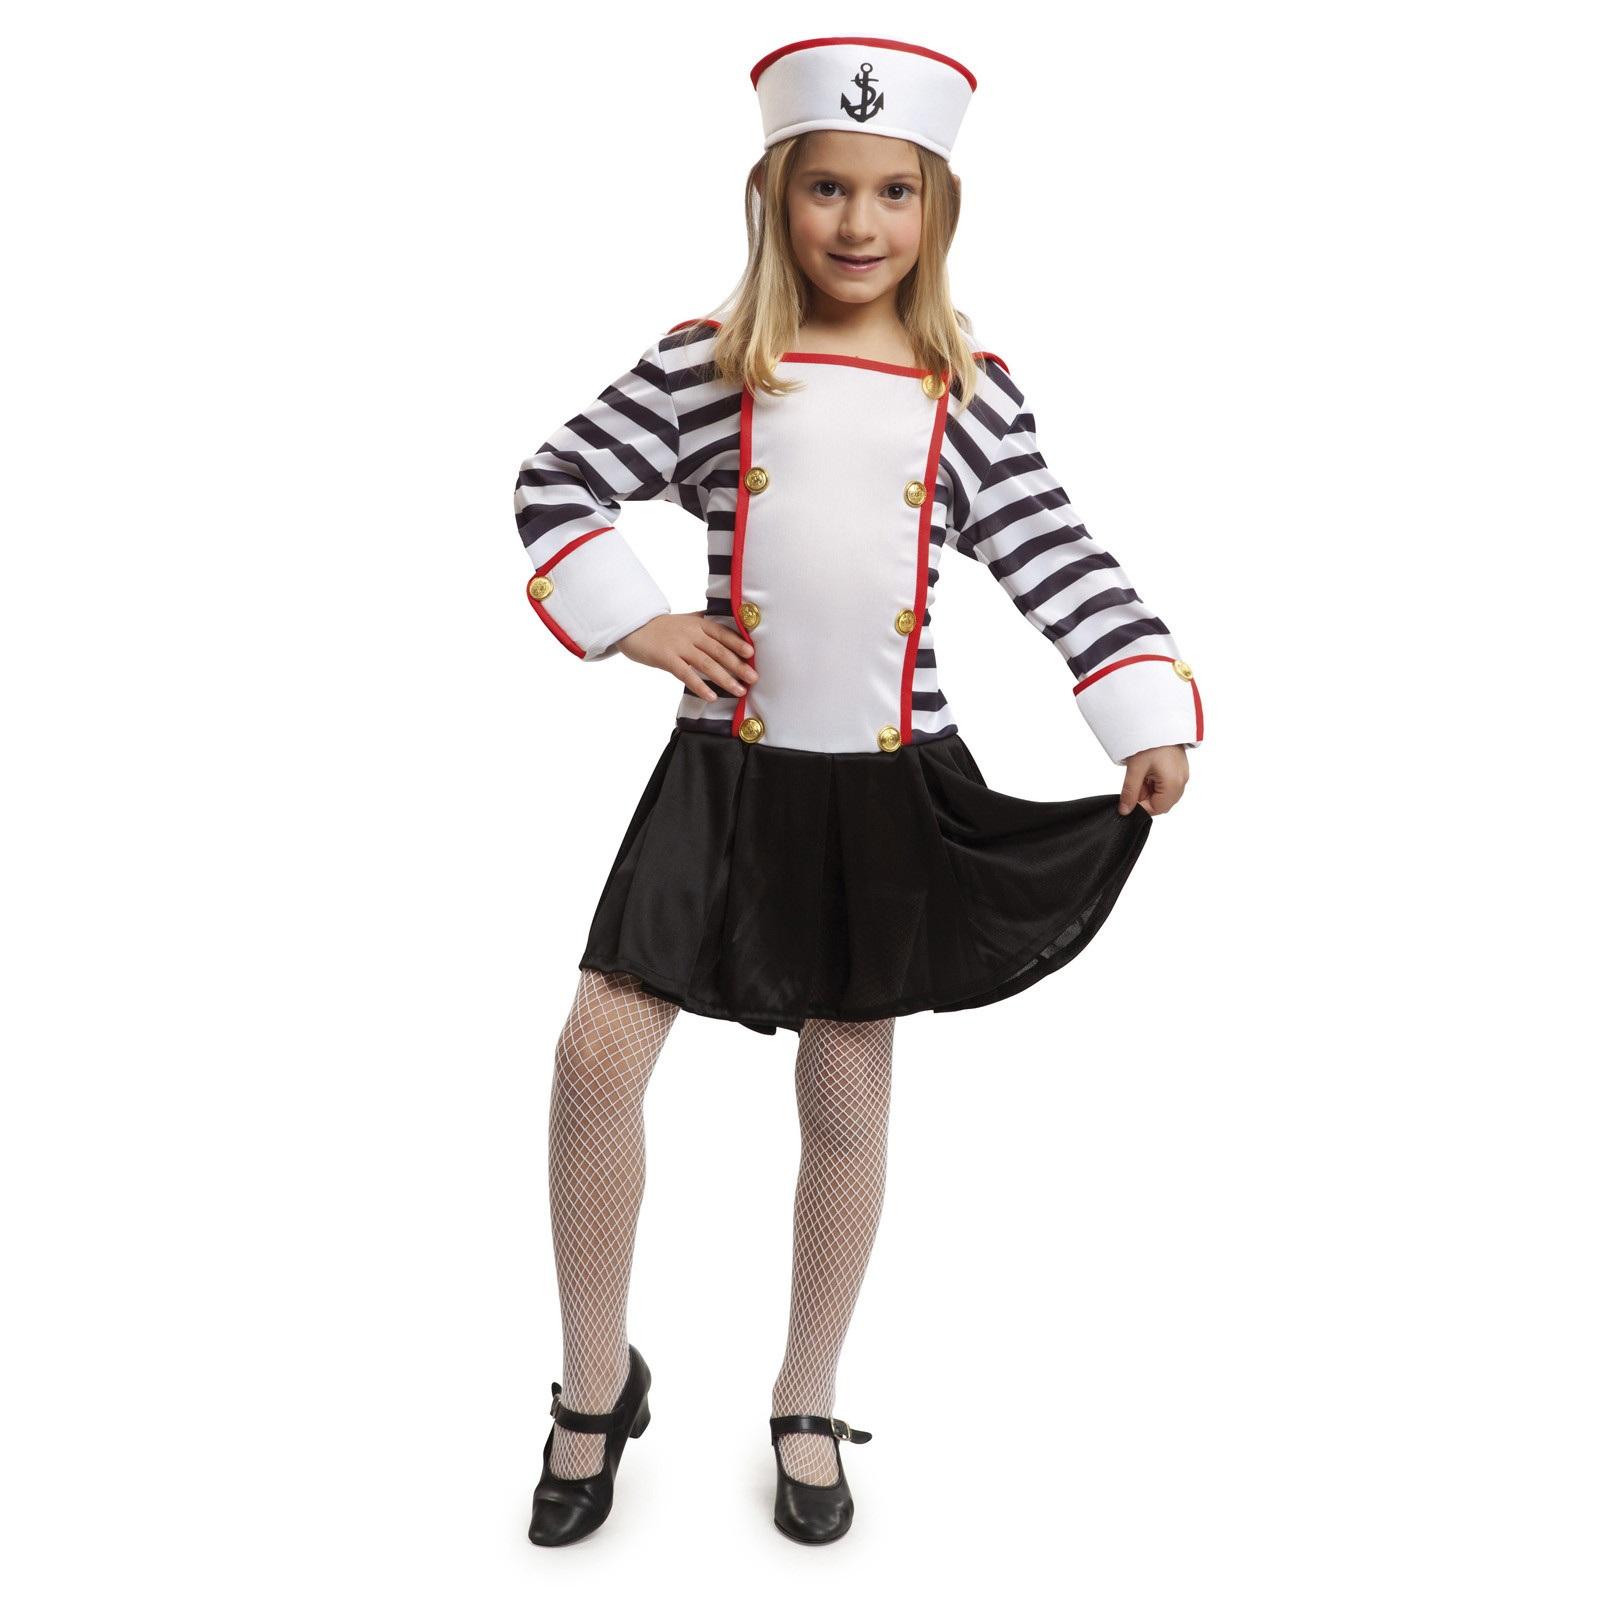 disfraz marinera niña 203506mom - DISFRAZ DE MARINERA RAYAS NIÑA